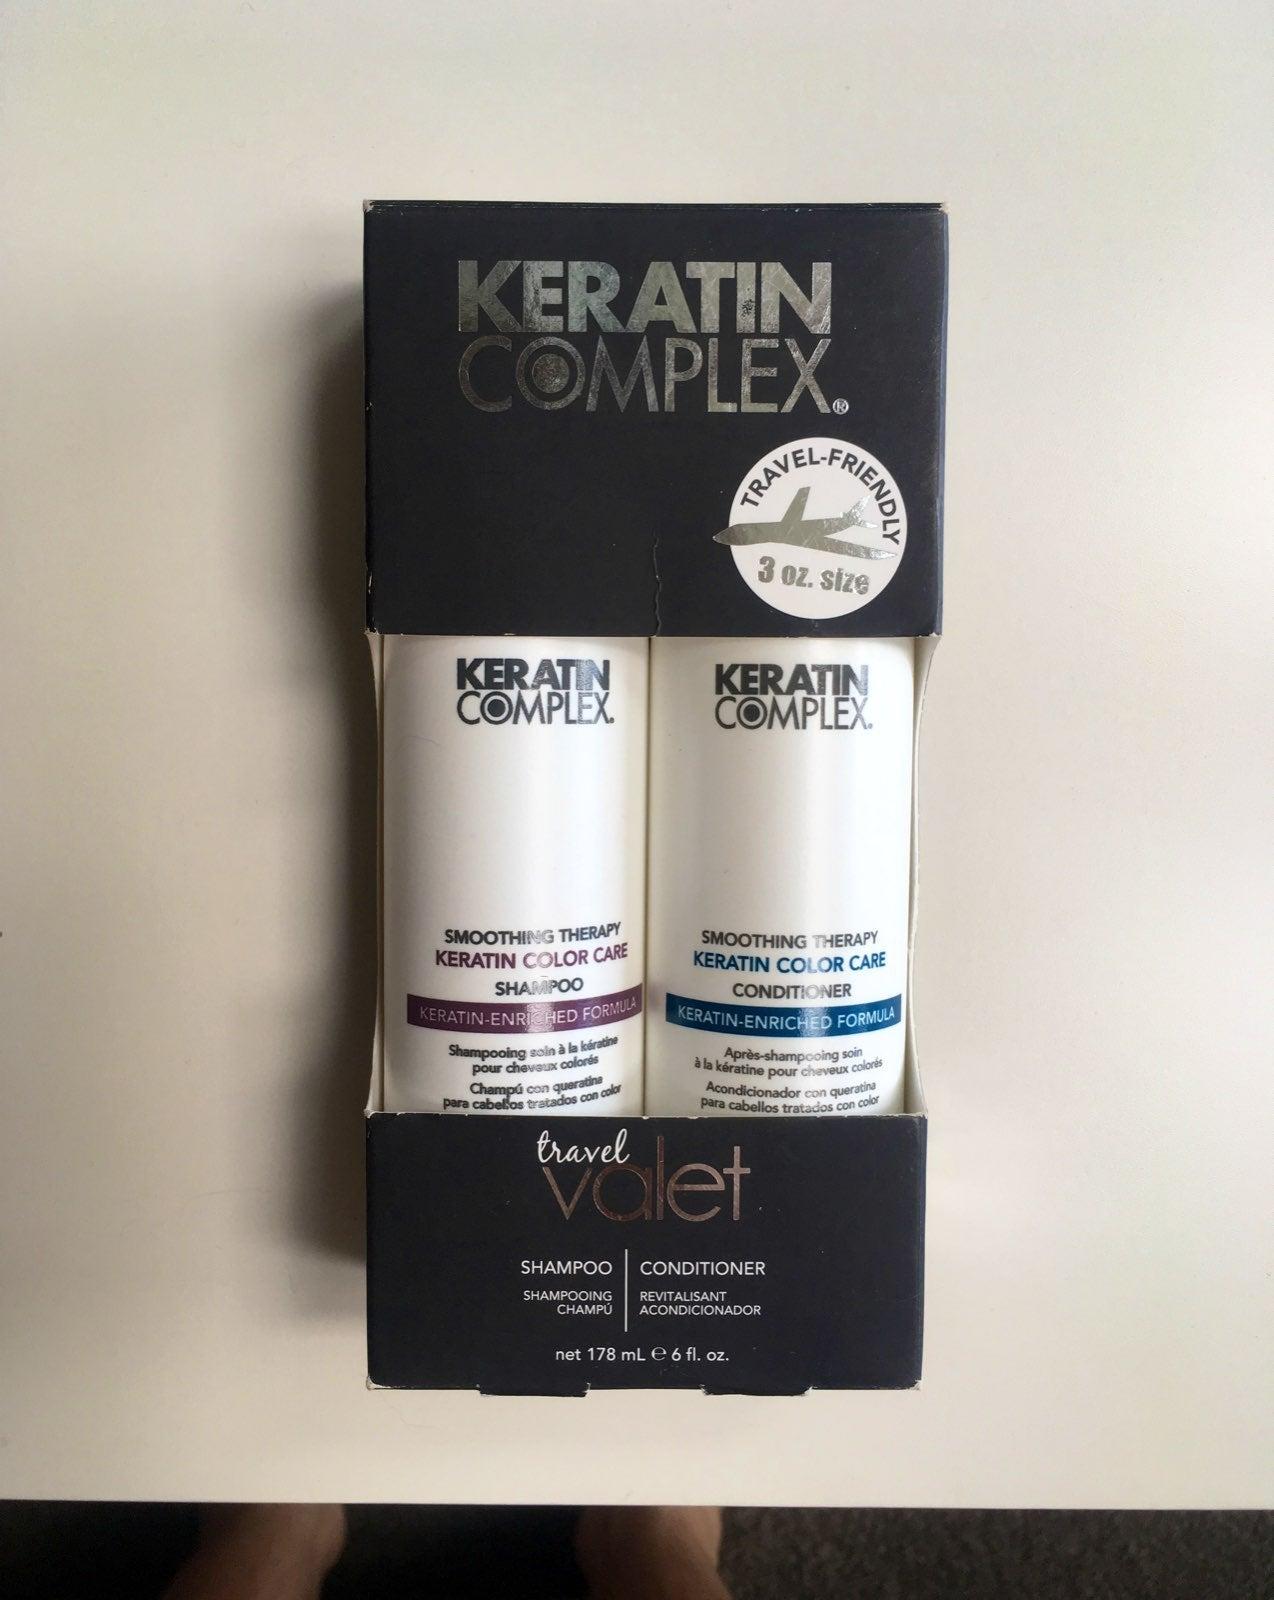 Keratin Complex Travel Valet